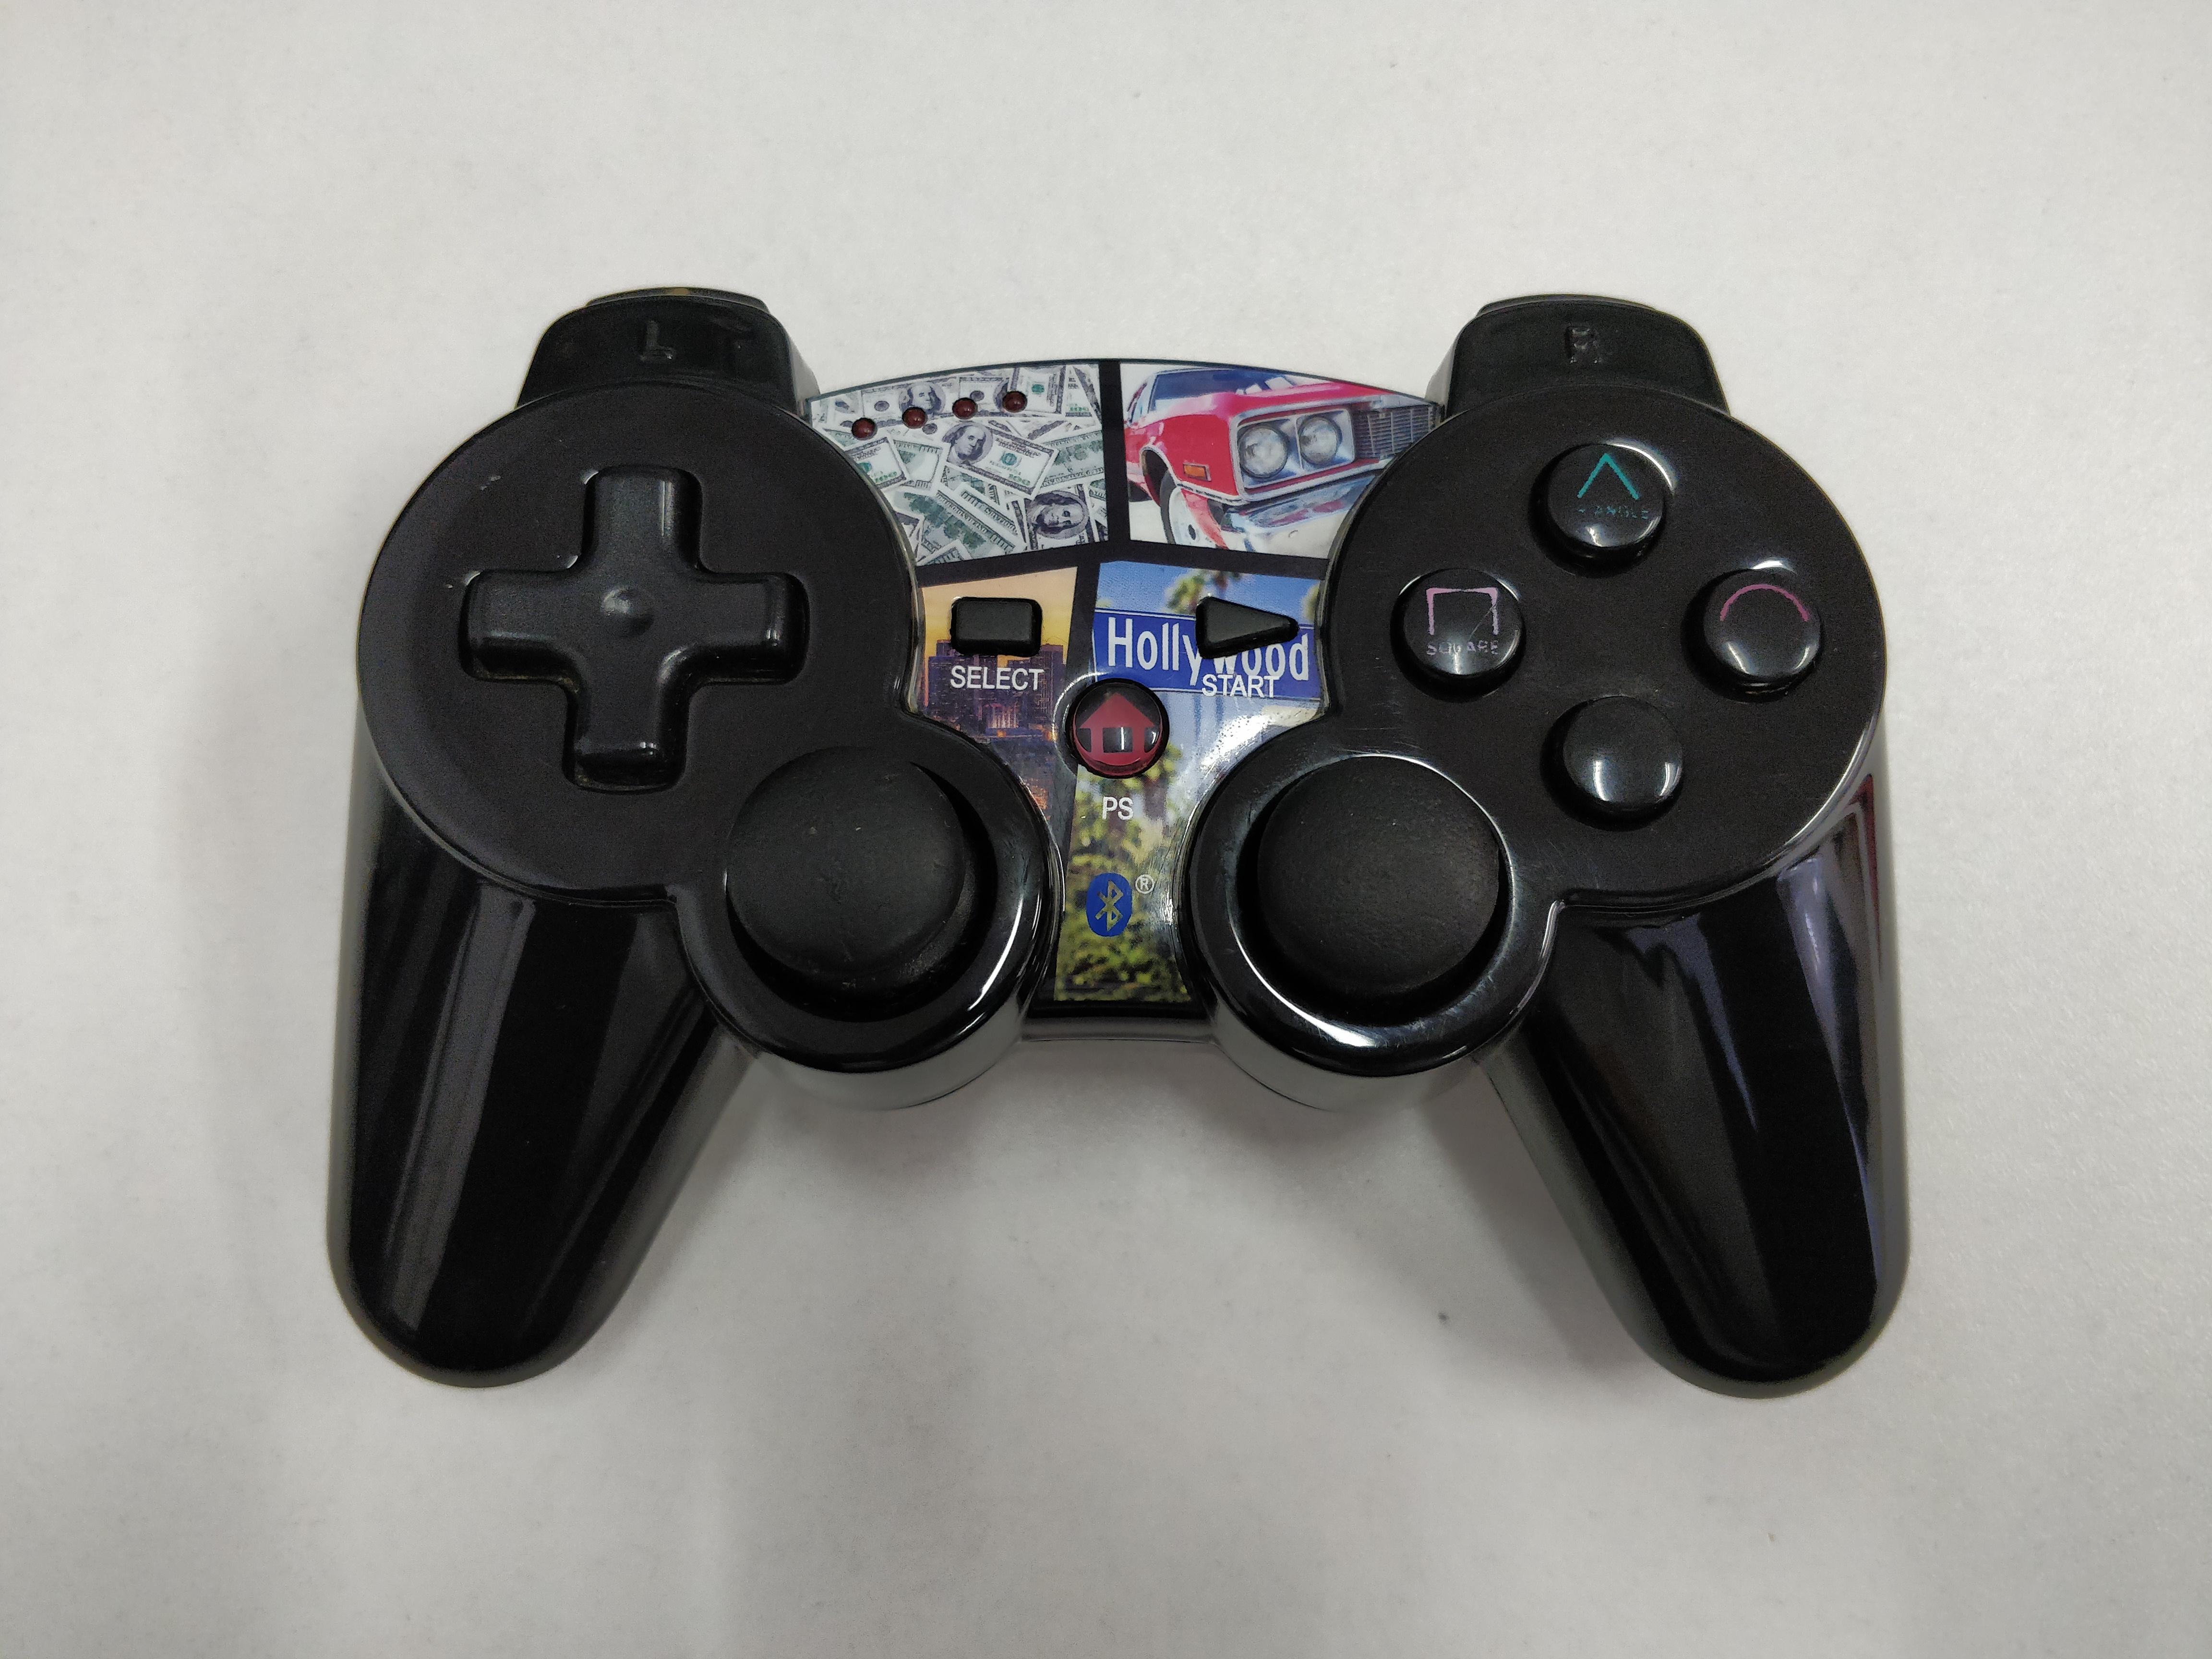 [PS3] Bezdrátový Ovladač BigBen - California (estetická vada)